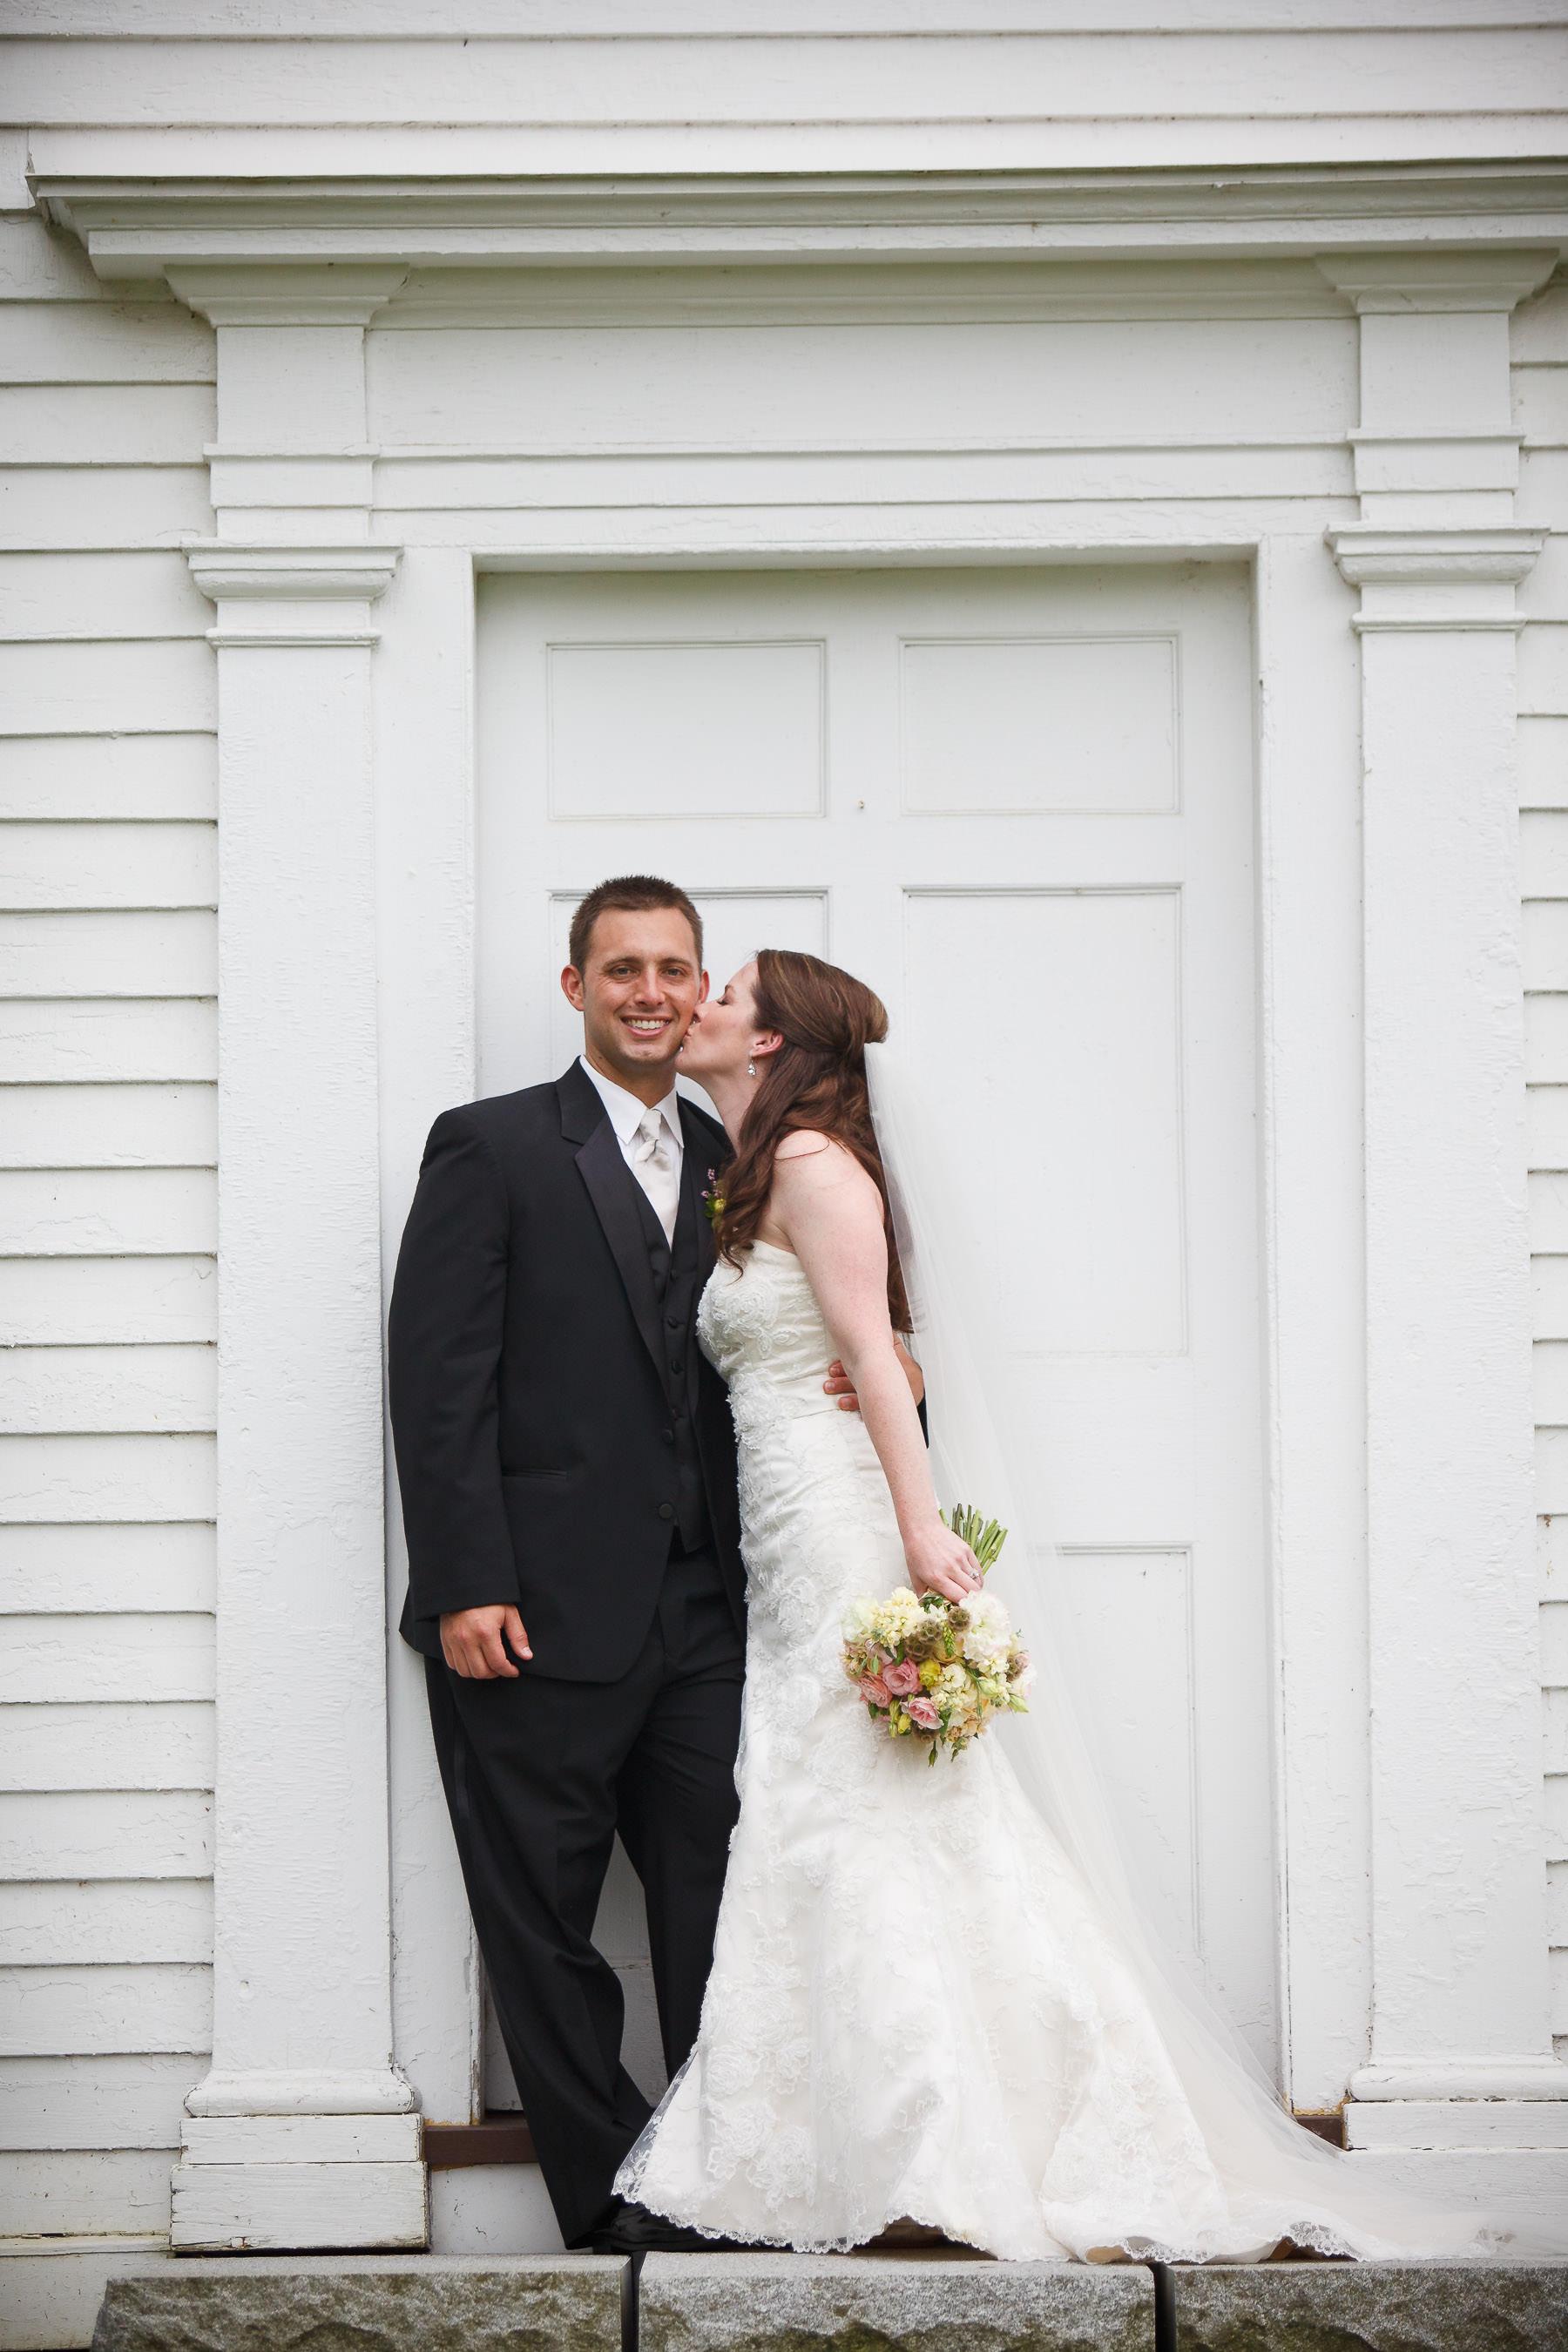 Elegant Rustic Wedding | West Monitor Barn | Chris + Carrie